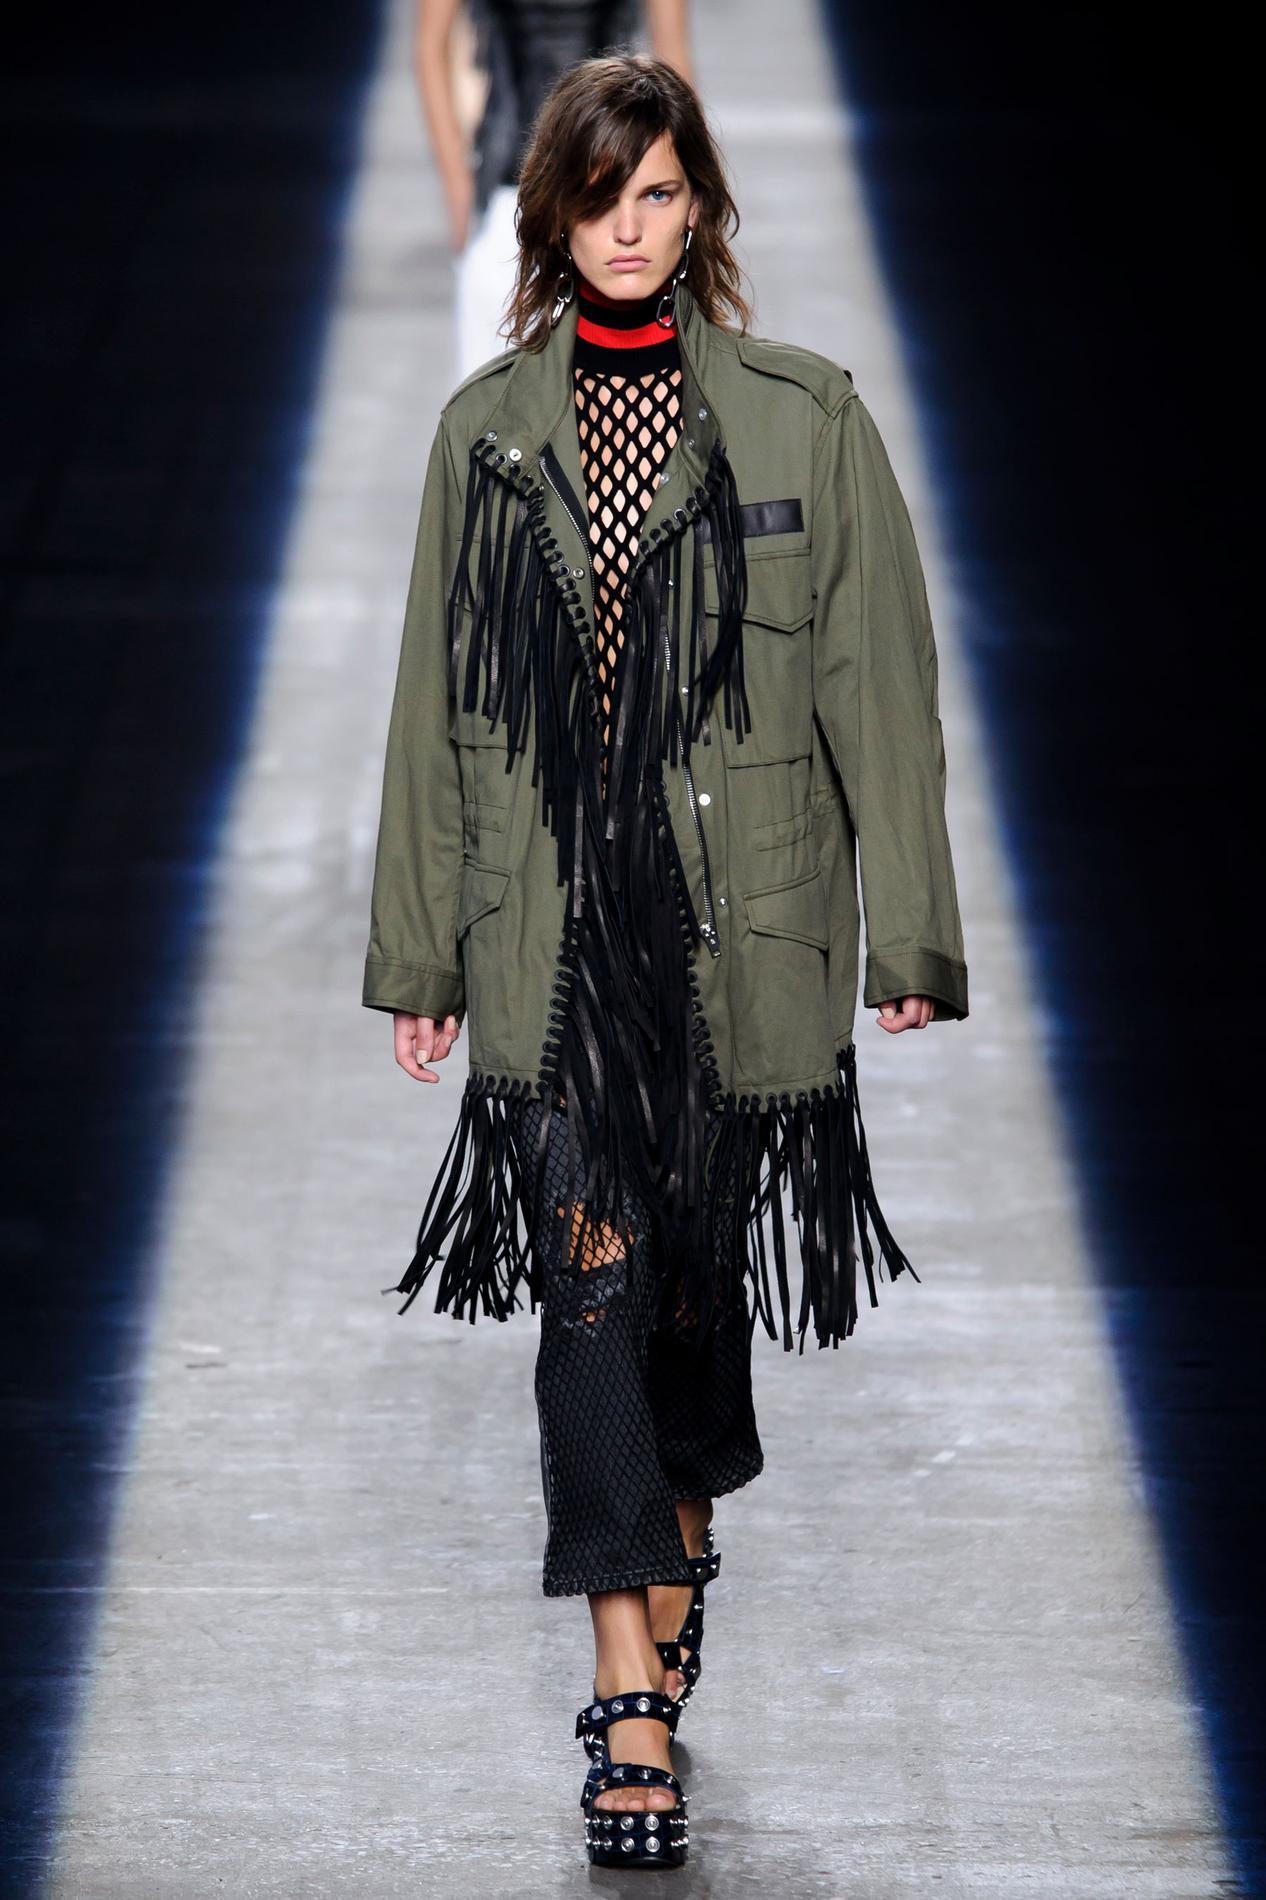 robes chemises franges crochet vintage le vestiaire du printemps t 2016 le figaro madame. Black Bedroom Furniture Sets. Home Design Ideas